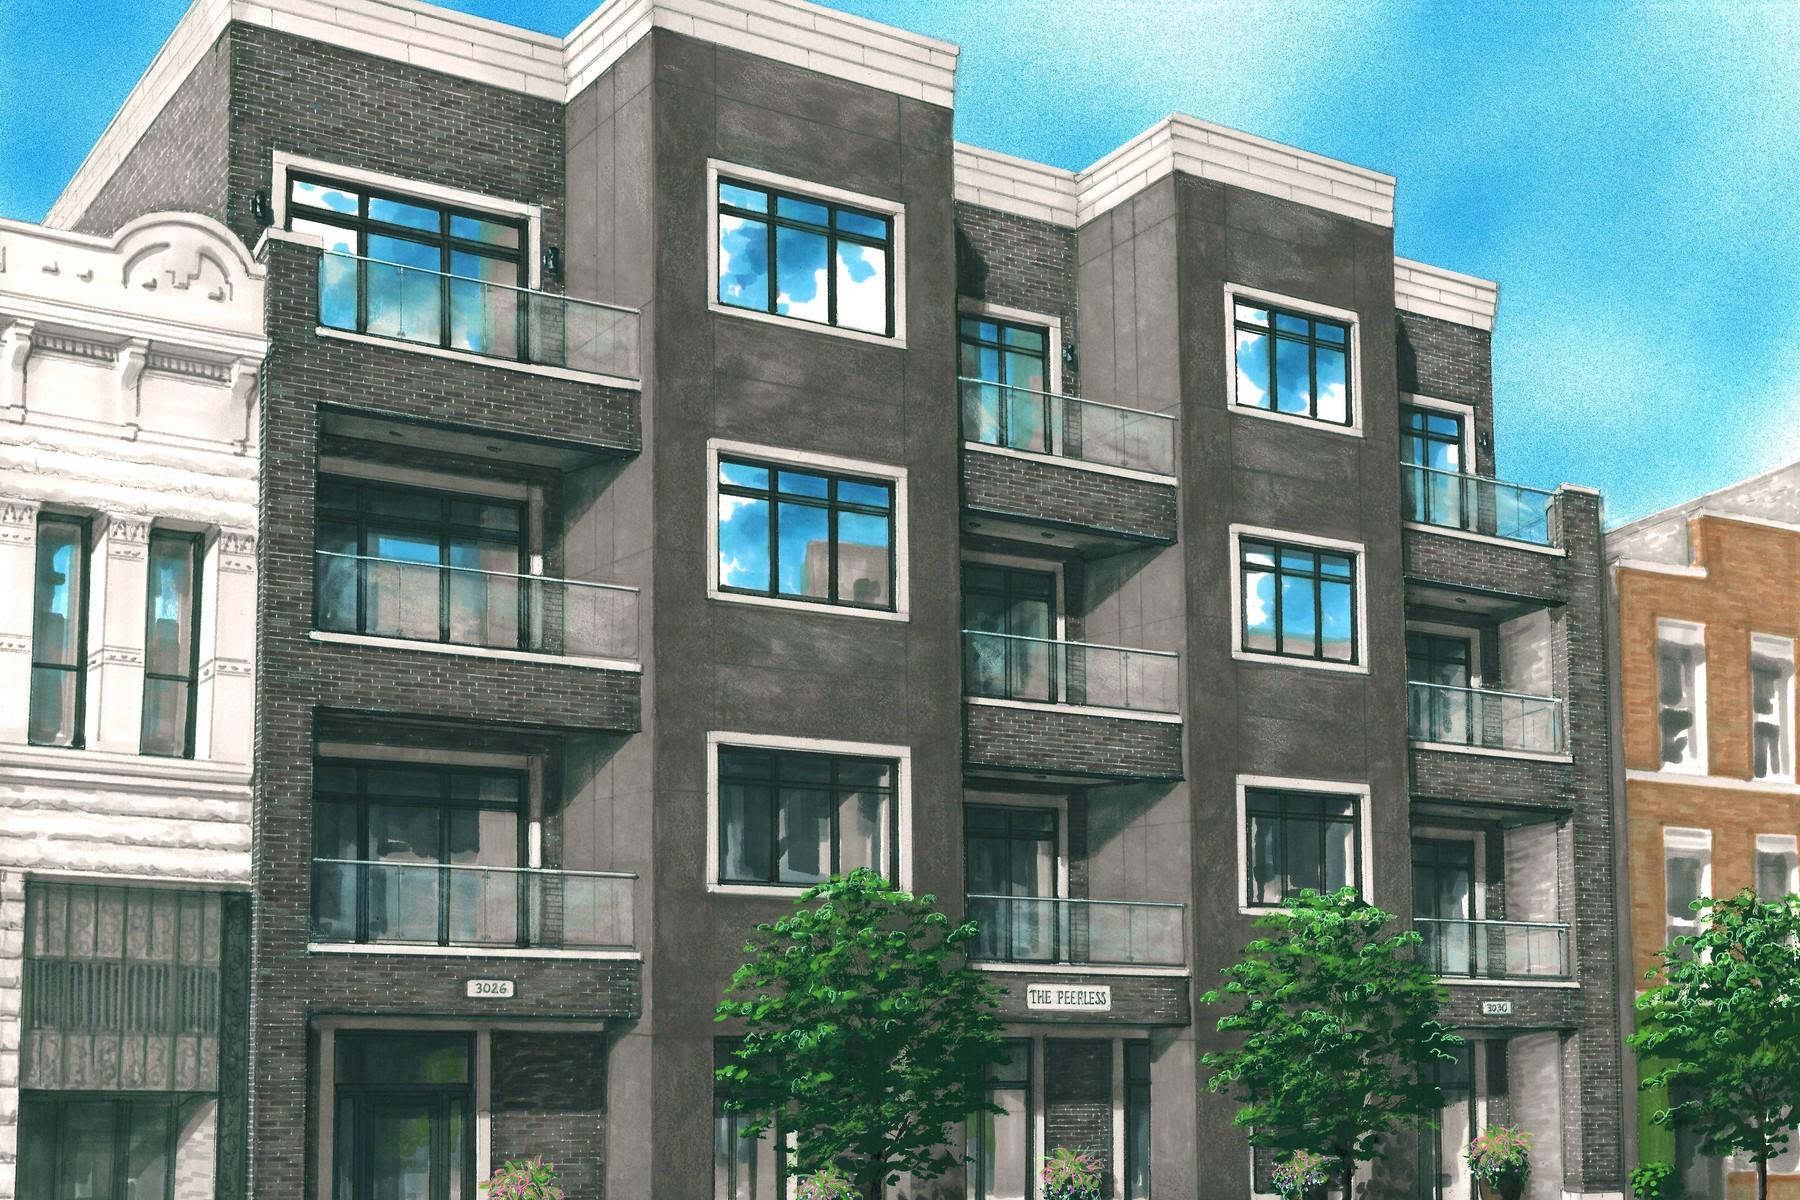 Condomínio para Venda às Luxury New Construction Condo 3026 N Lincoln Avenue Unit 4A Chicago, Illinois, 60657 Estados Unidos